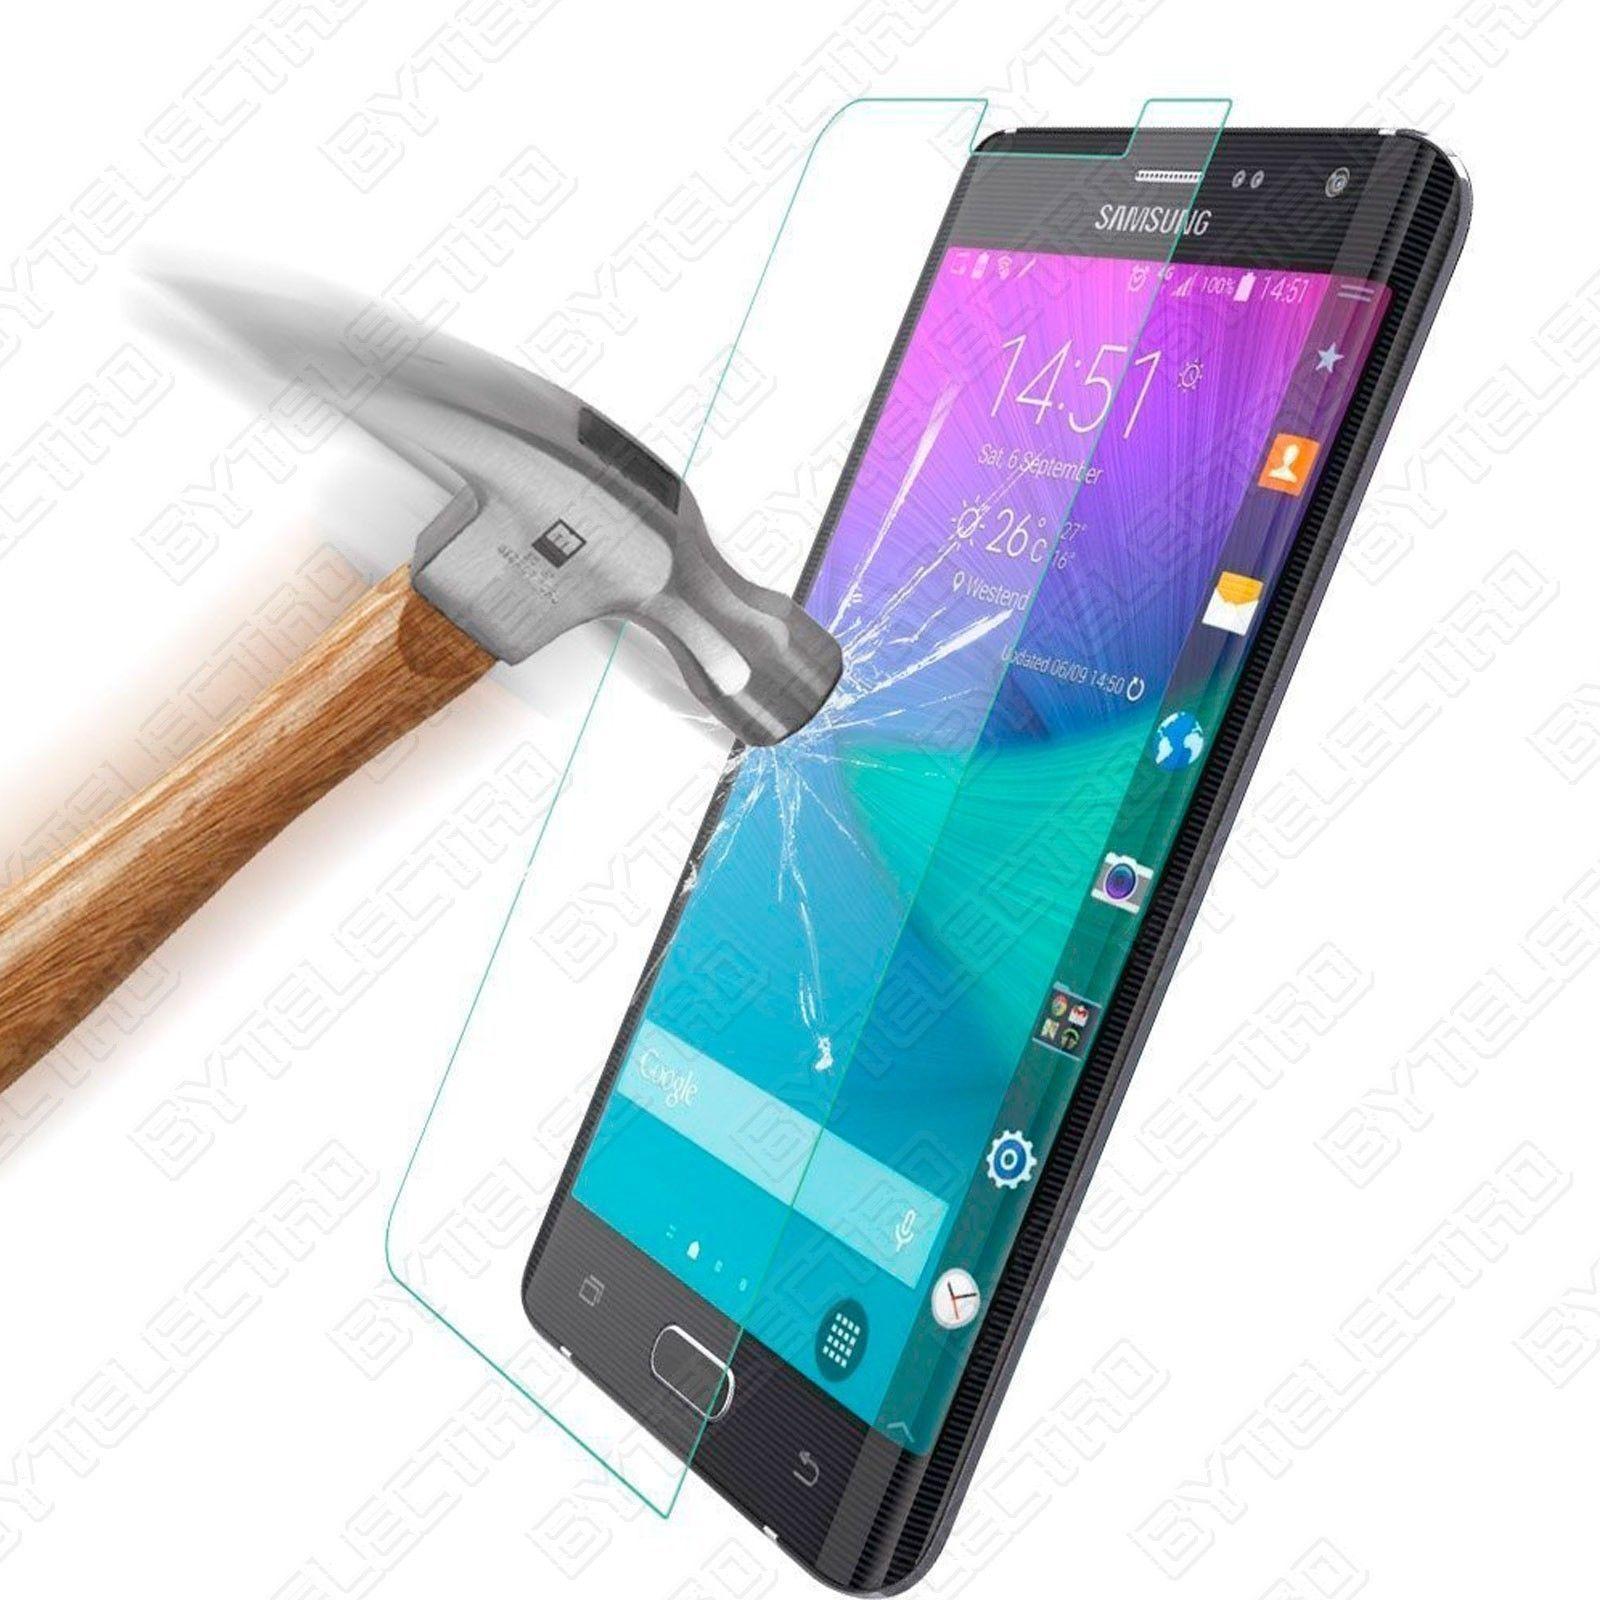 Protector Pantalla CRISTAL TEMPLADO PREMIUM Para Samsung GALAXY NOTE EDGE 0